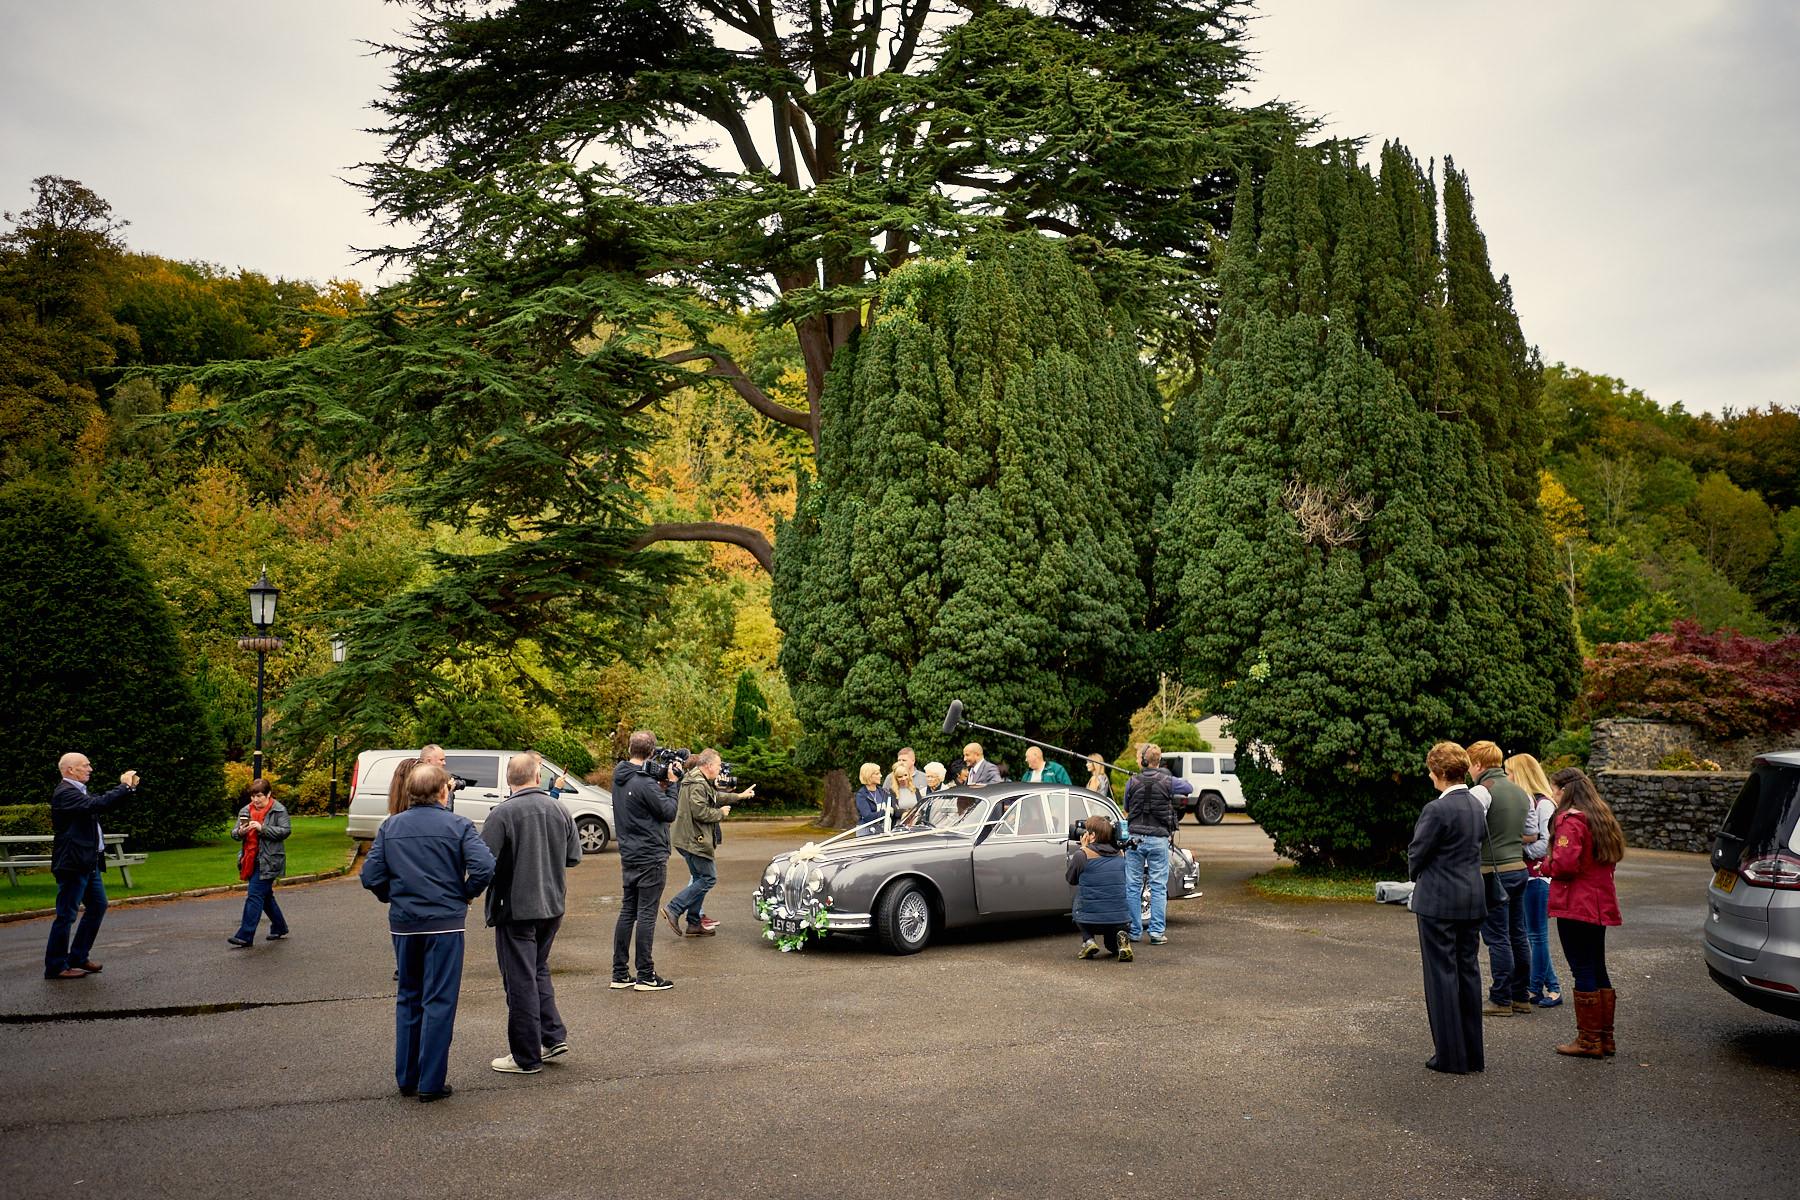 Car SOS film crew in Maenan Abbey car park